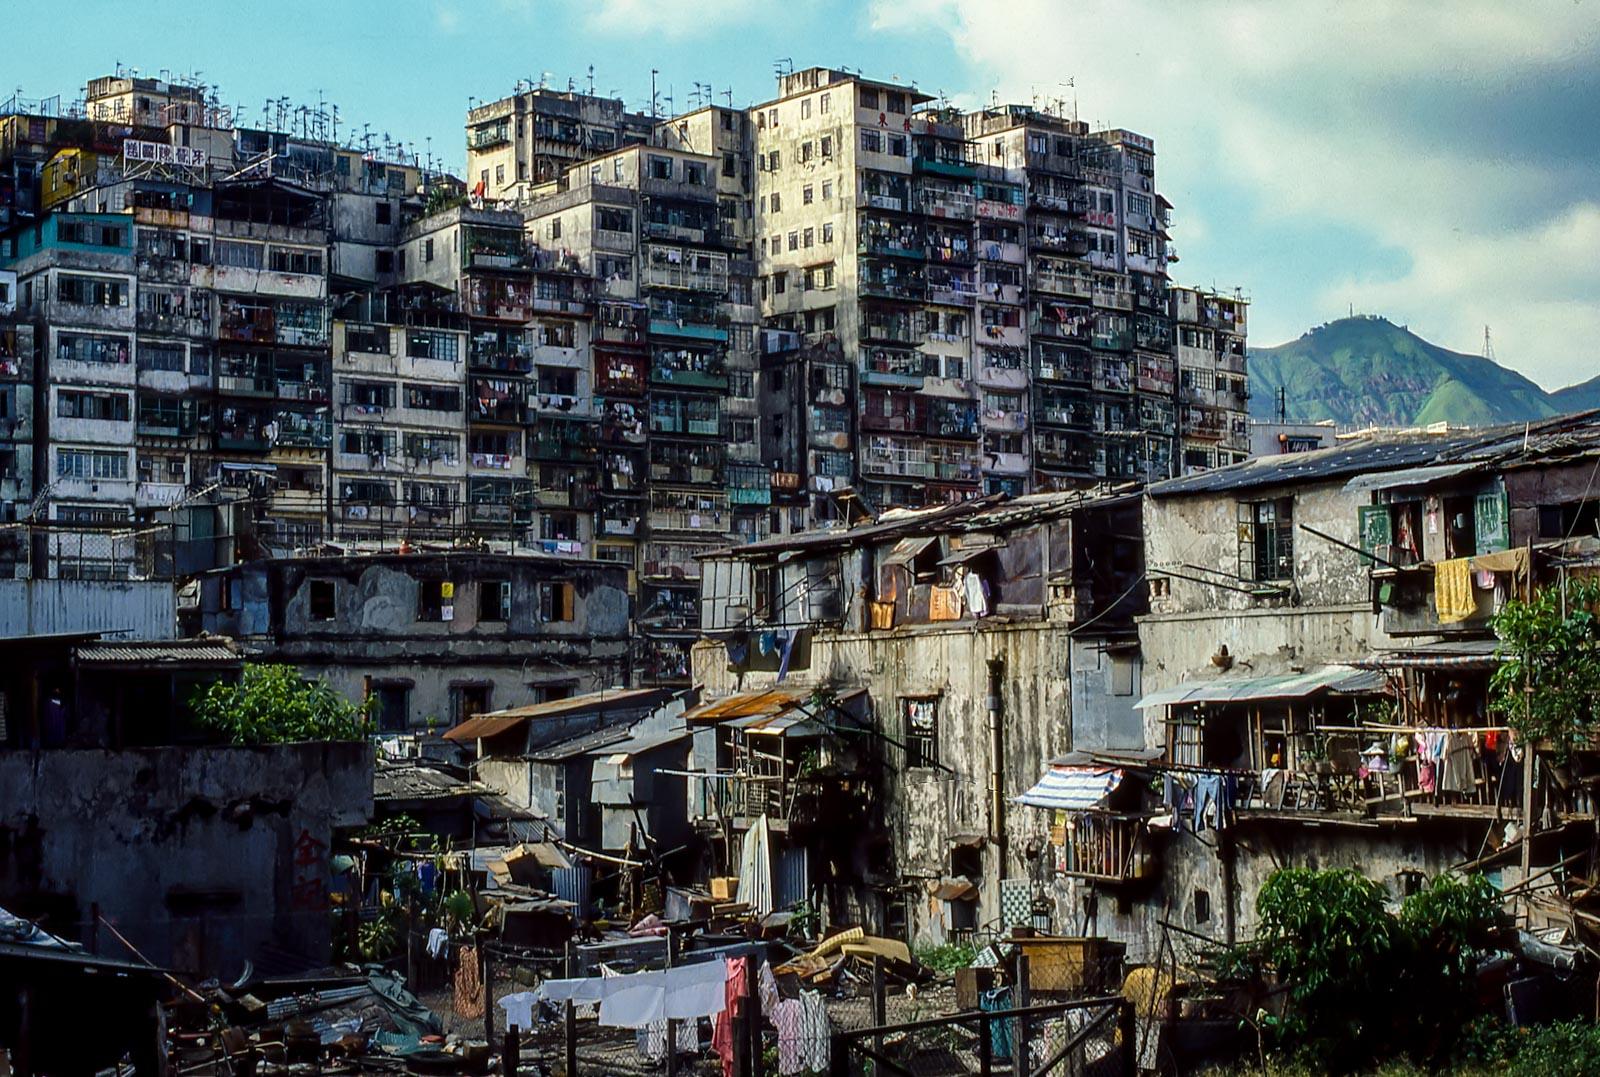 Kowloon Walled City 1985